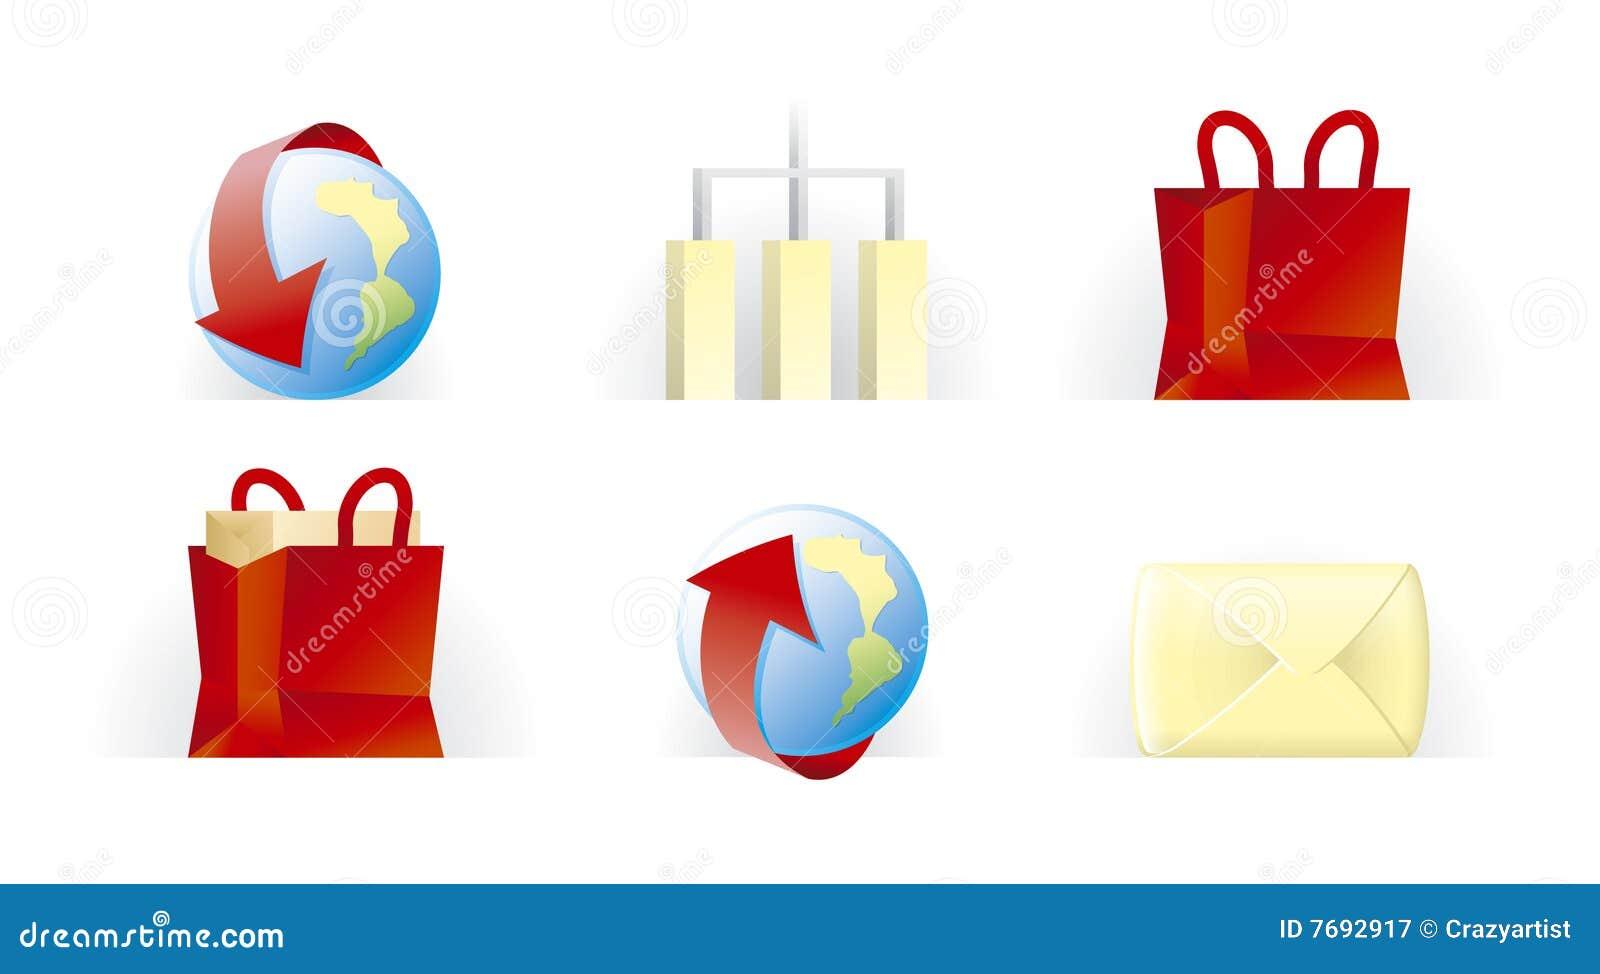 Site- und Internet-Ikonen   T.U.P.O. Farbe